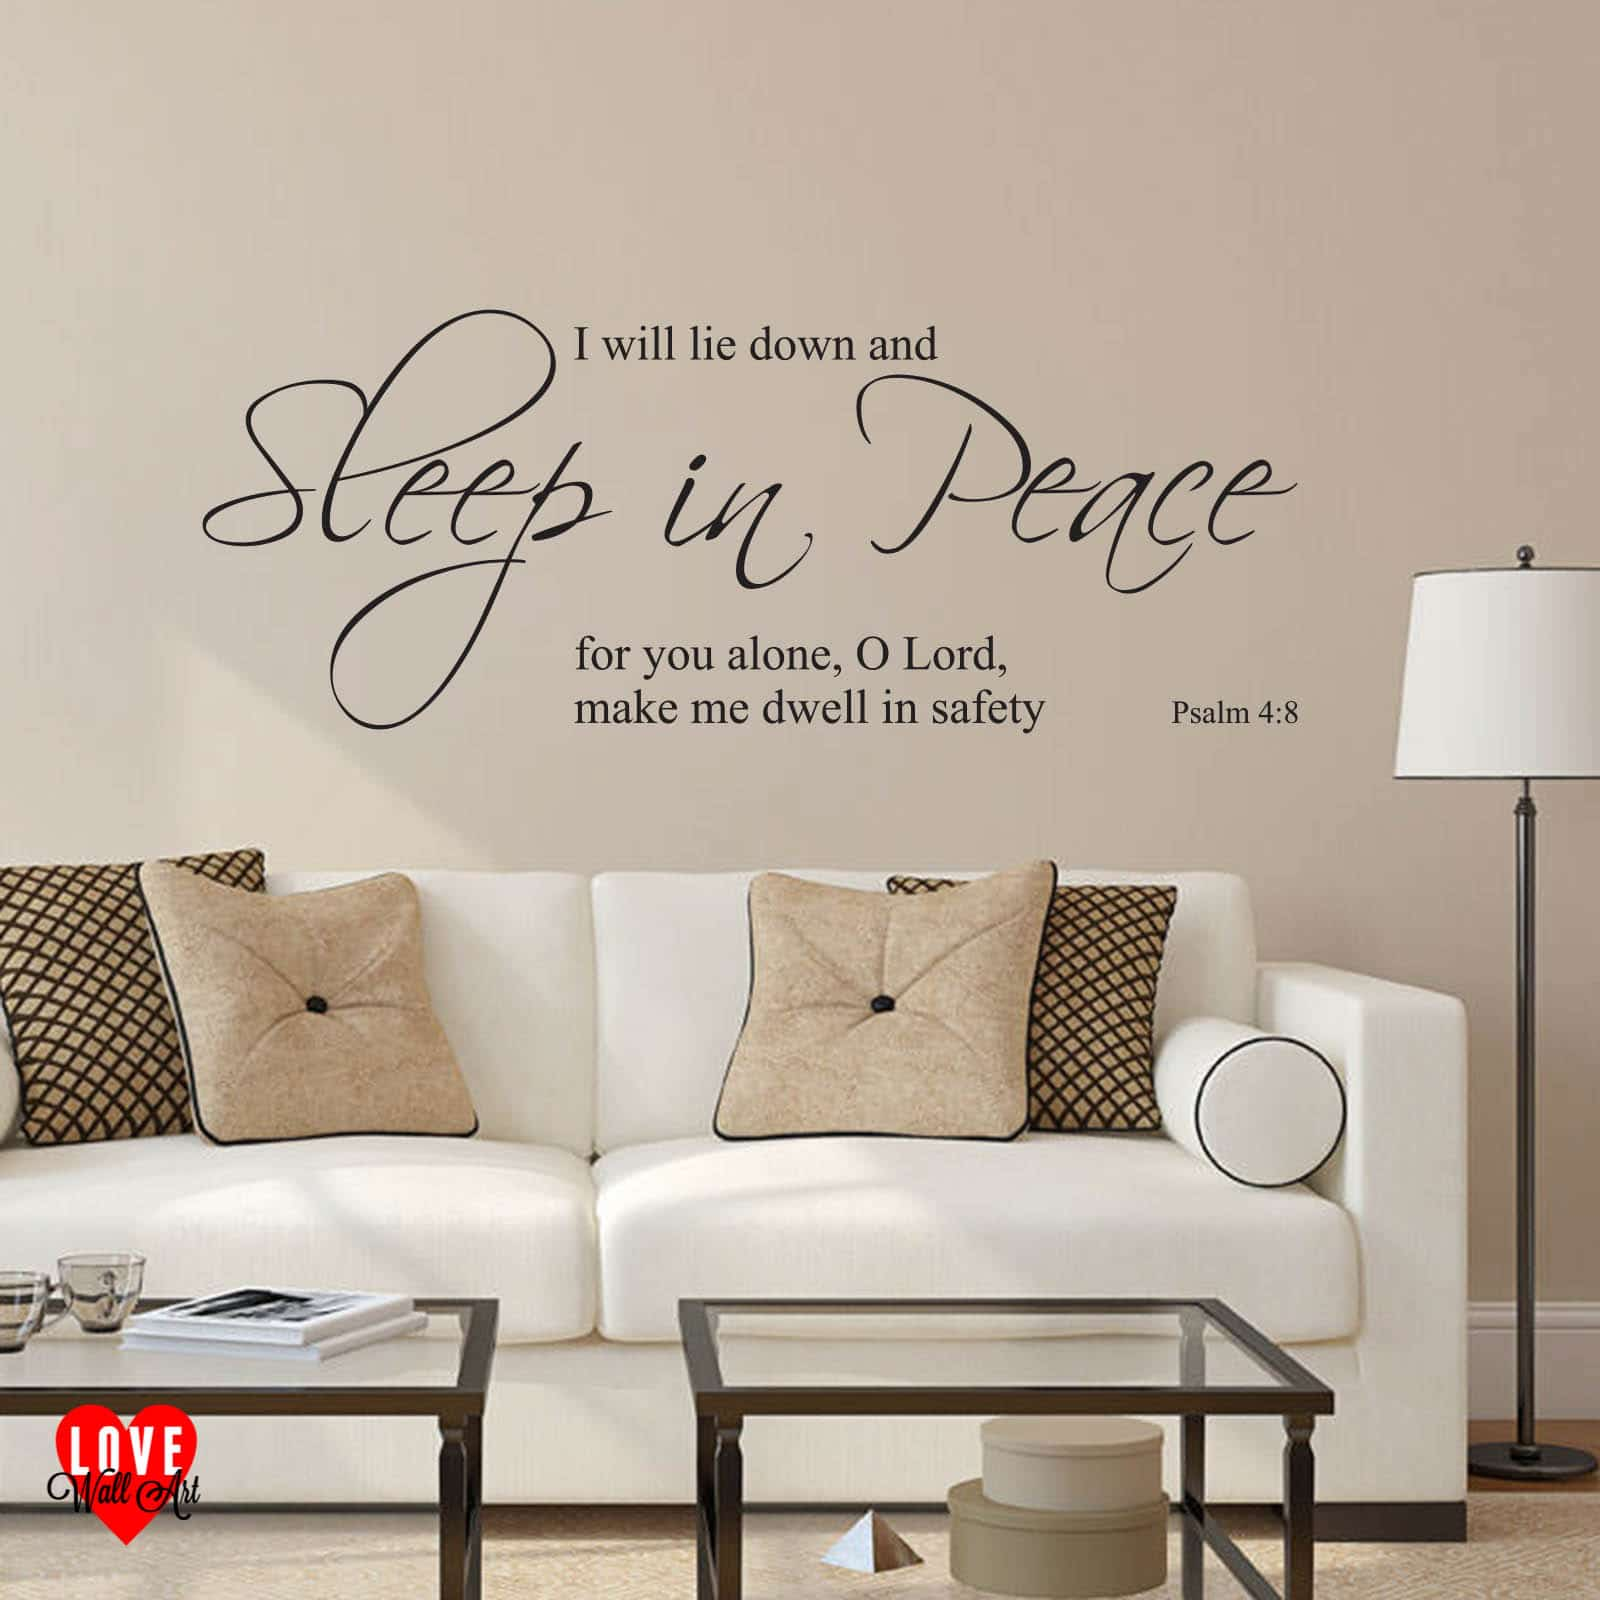 Wall Quote Sticker Sleep In Peace Psalm 4 8 Prayer Wall Art Sticker